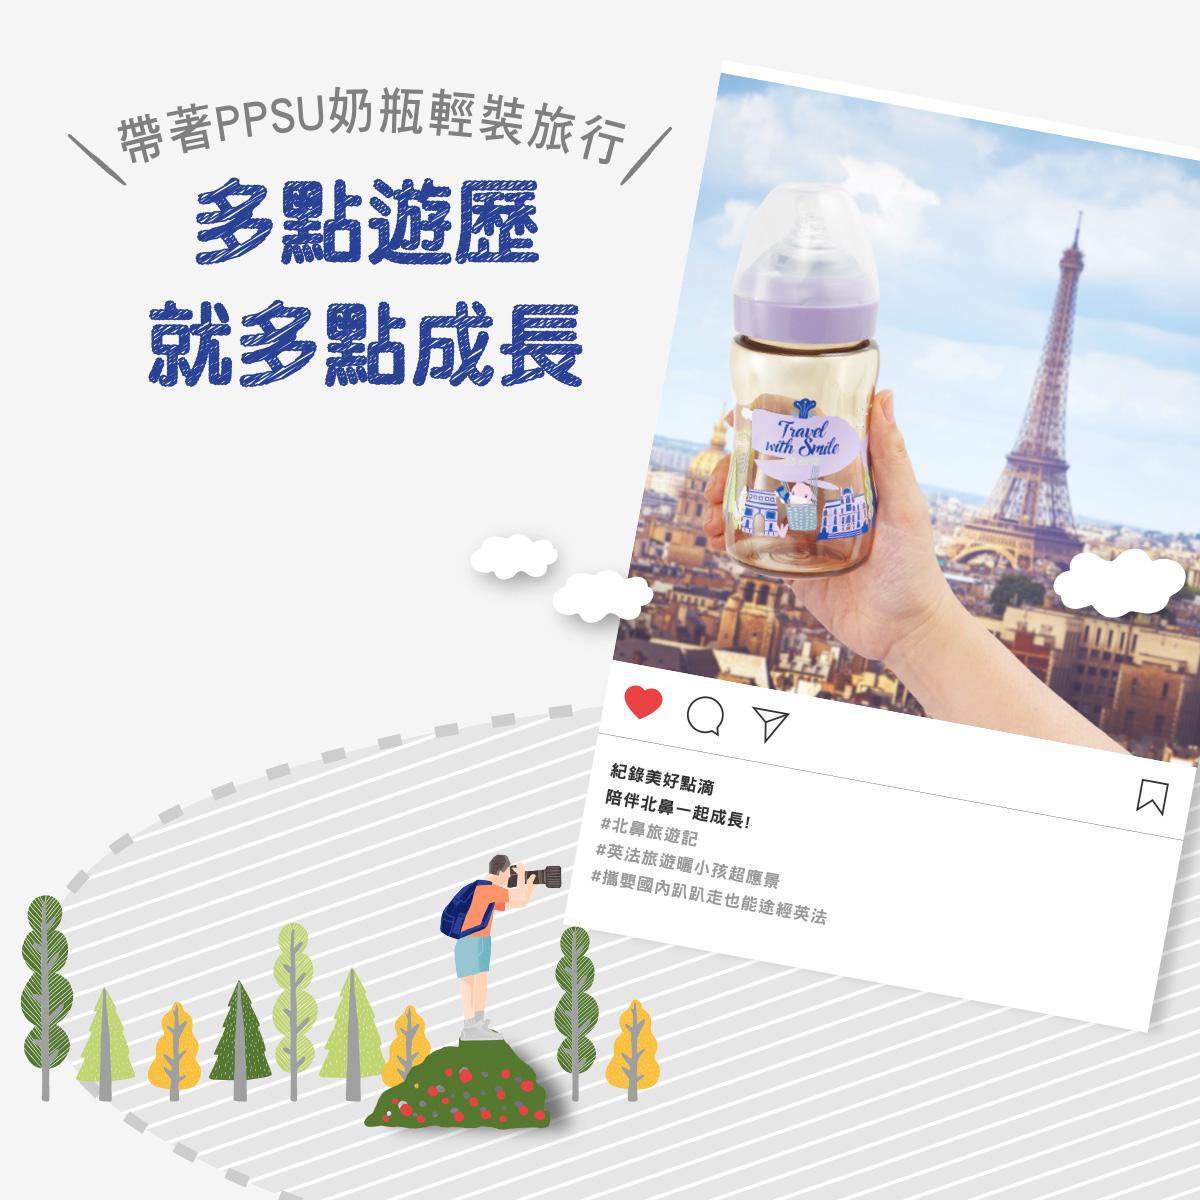 proimages/bottles/PPSU/5875/5875-品味巴黎PPSU奶瓶-EDM-2.jpg